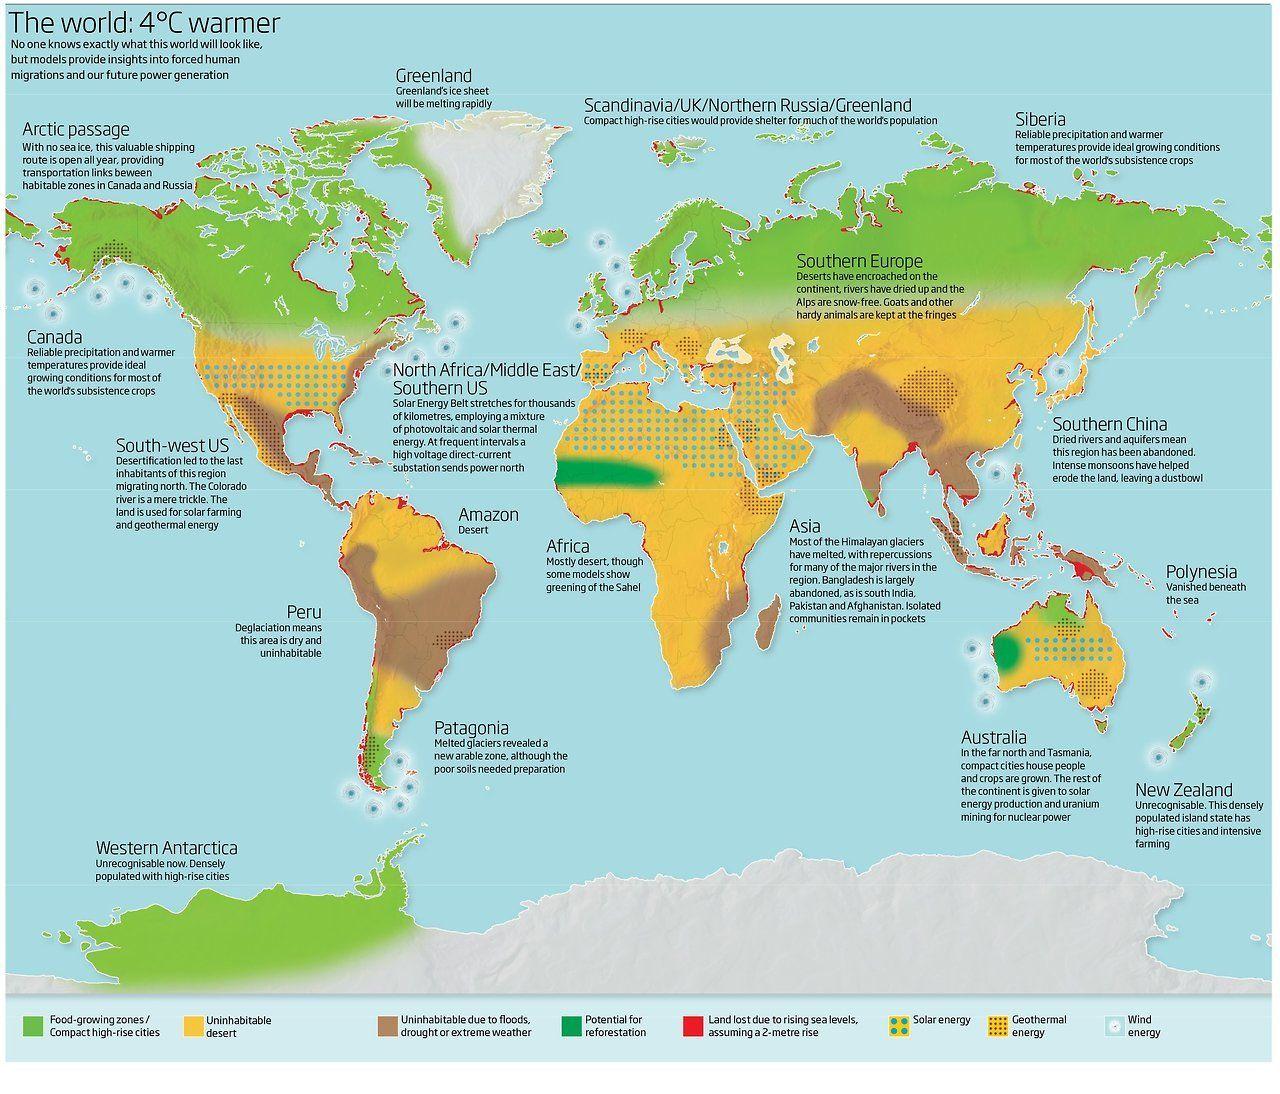 Tumblr Org4vk9vt21va88f5o1 1280 Jpg 1280 1094 Mapas Del Clima Mapas Del Mundo Calentamiento Global